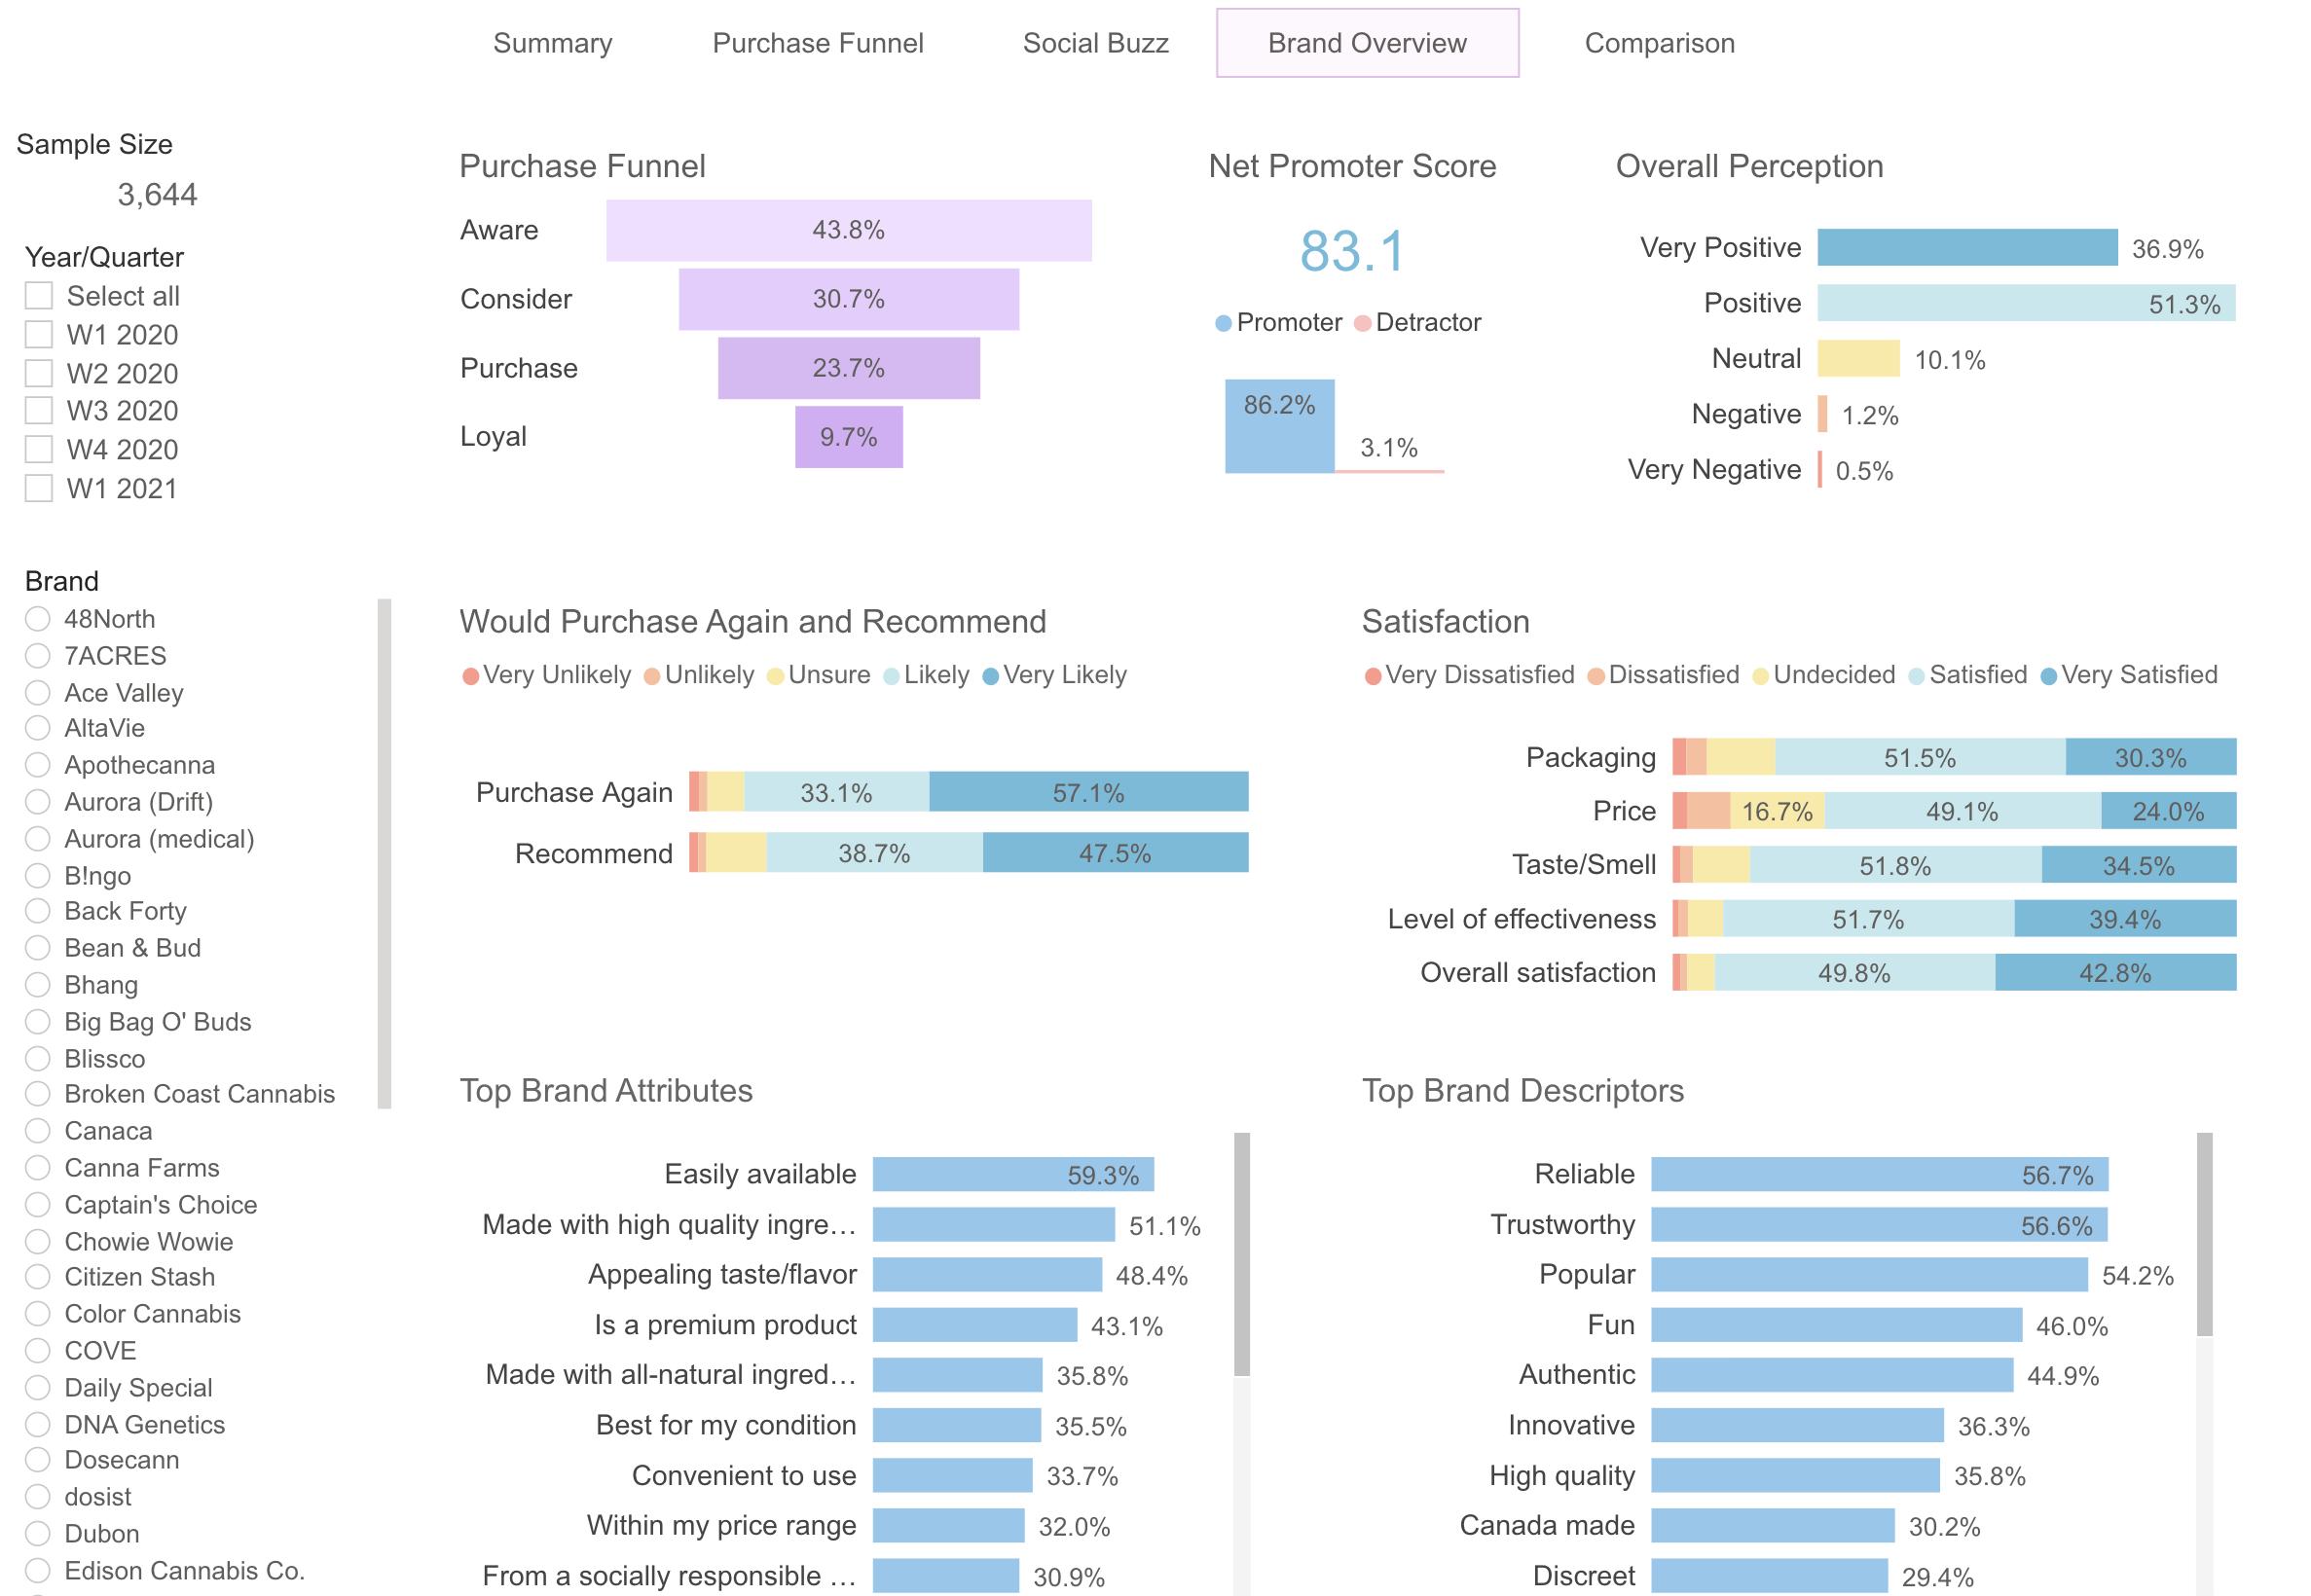 mage of Brightfield's cbd brand health tracker showing cbd buyer personas for each brand